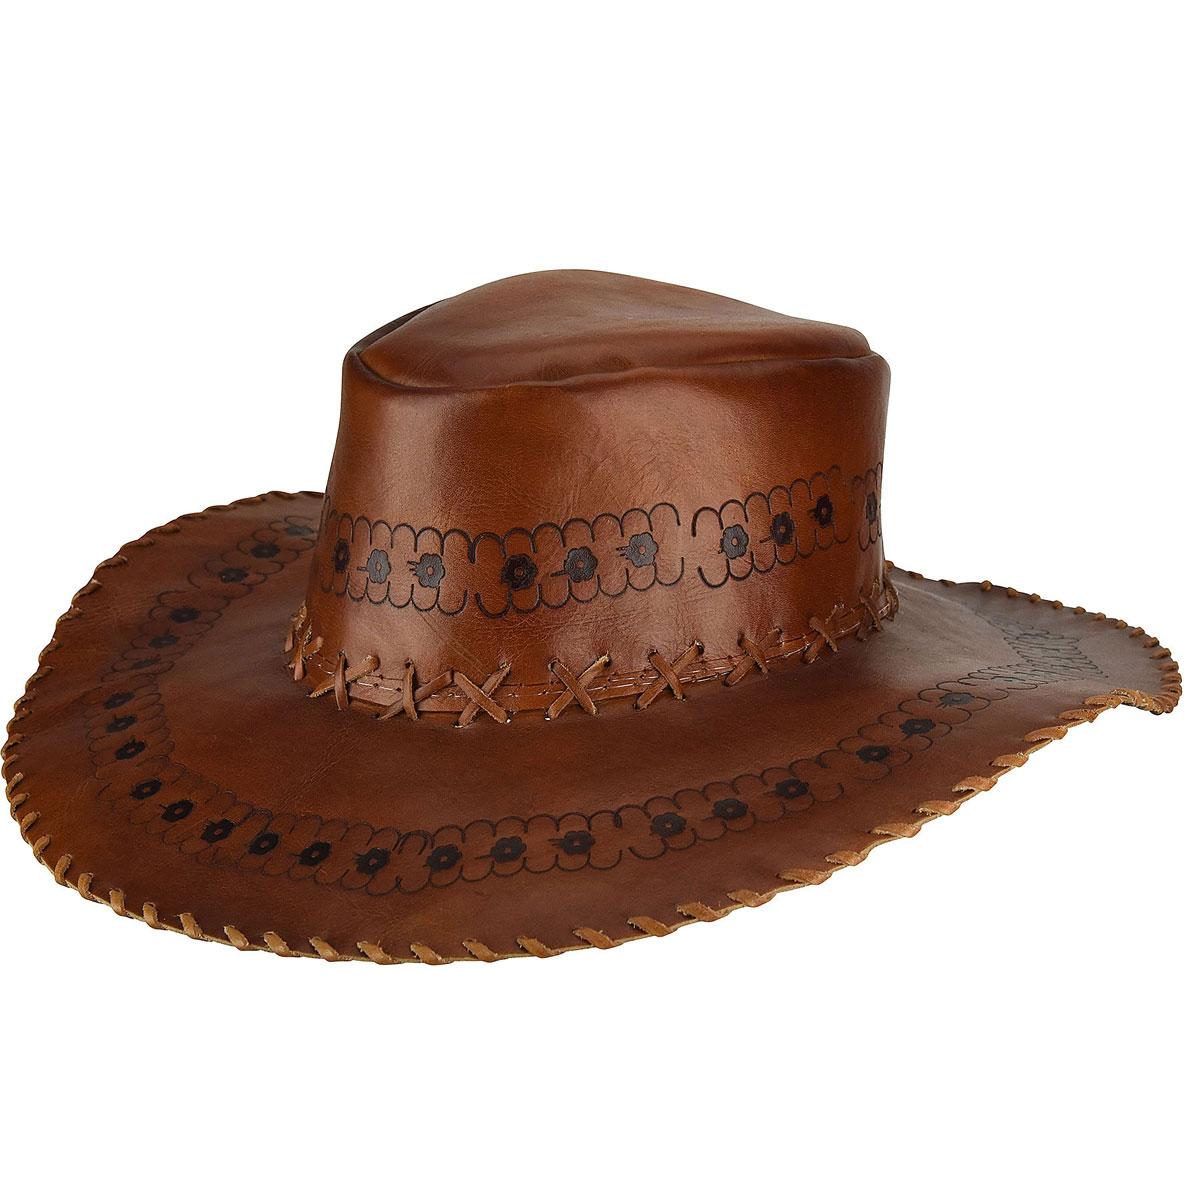 8 Classic Vintage Halloween Costumes Renegade by Bailey reg Roamer Leather Western Hat $100.00 AT vintagedancer.com